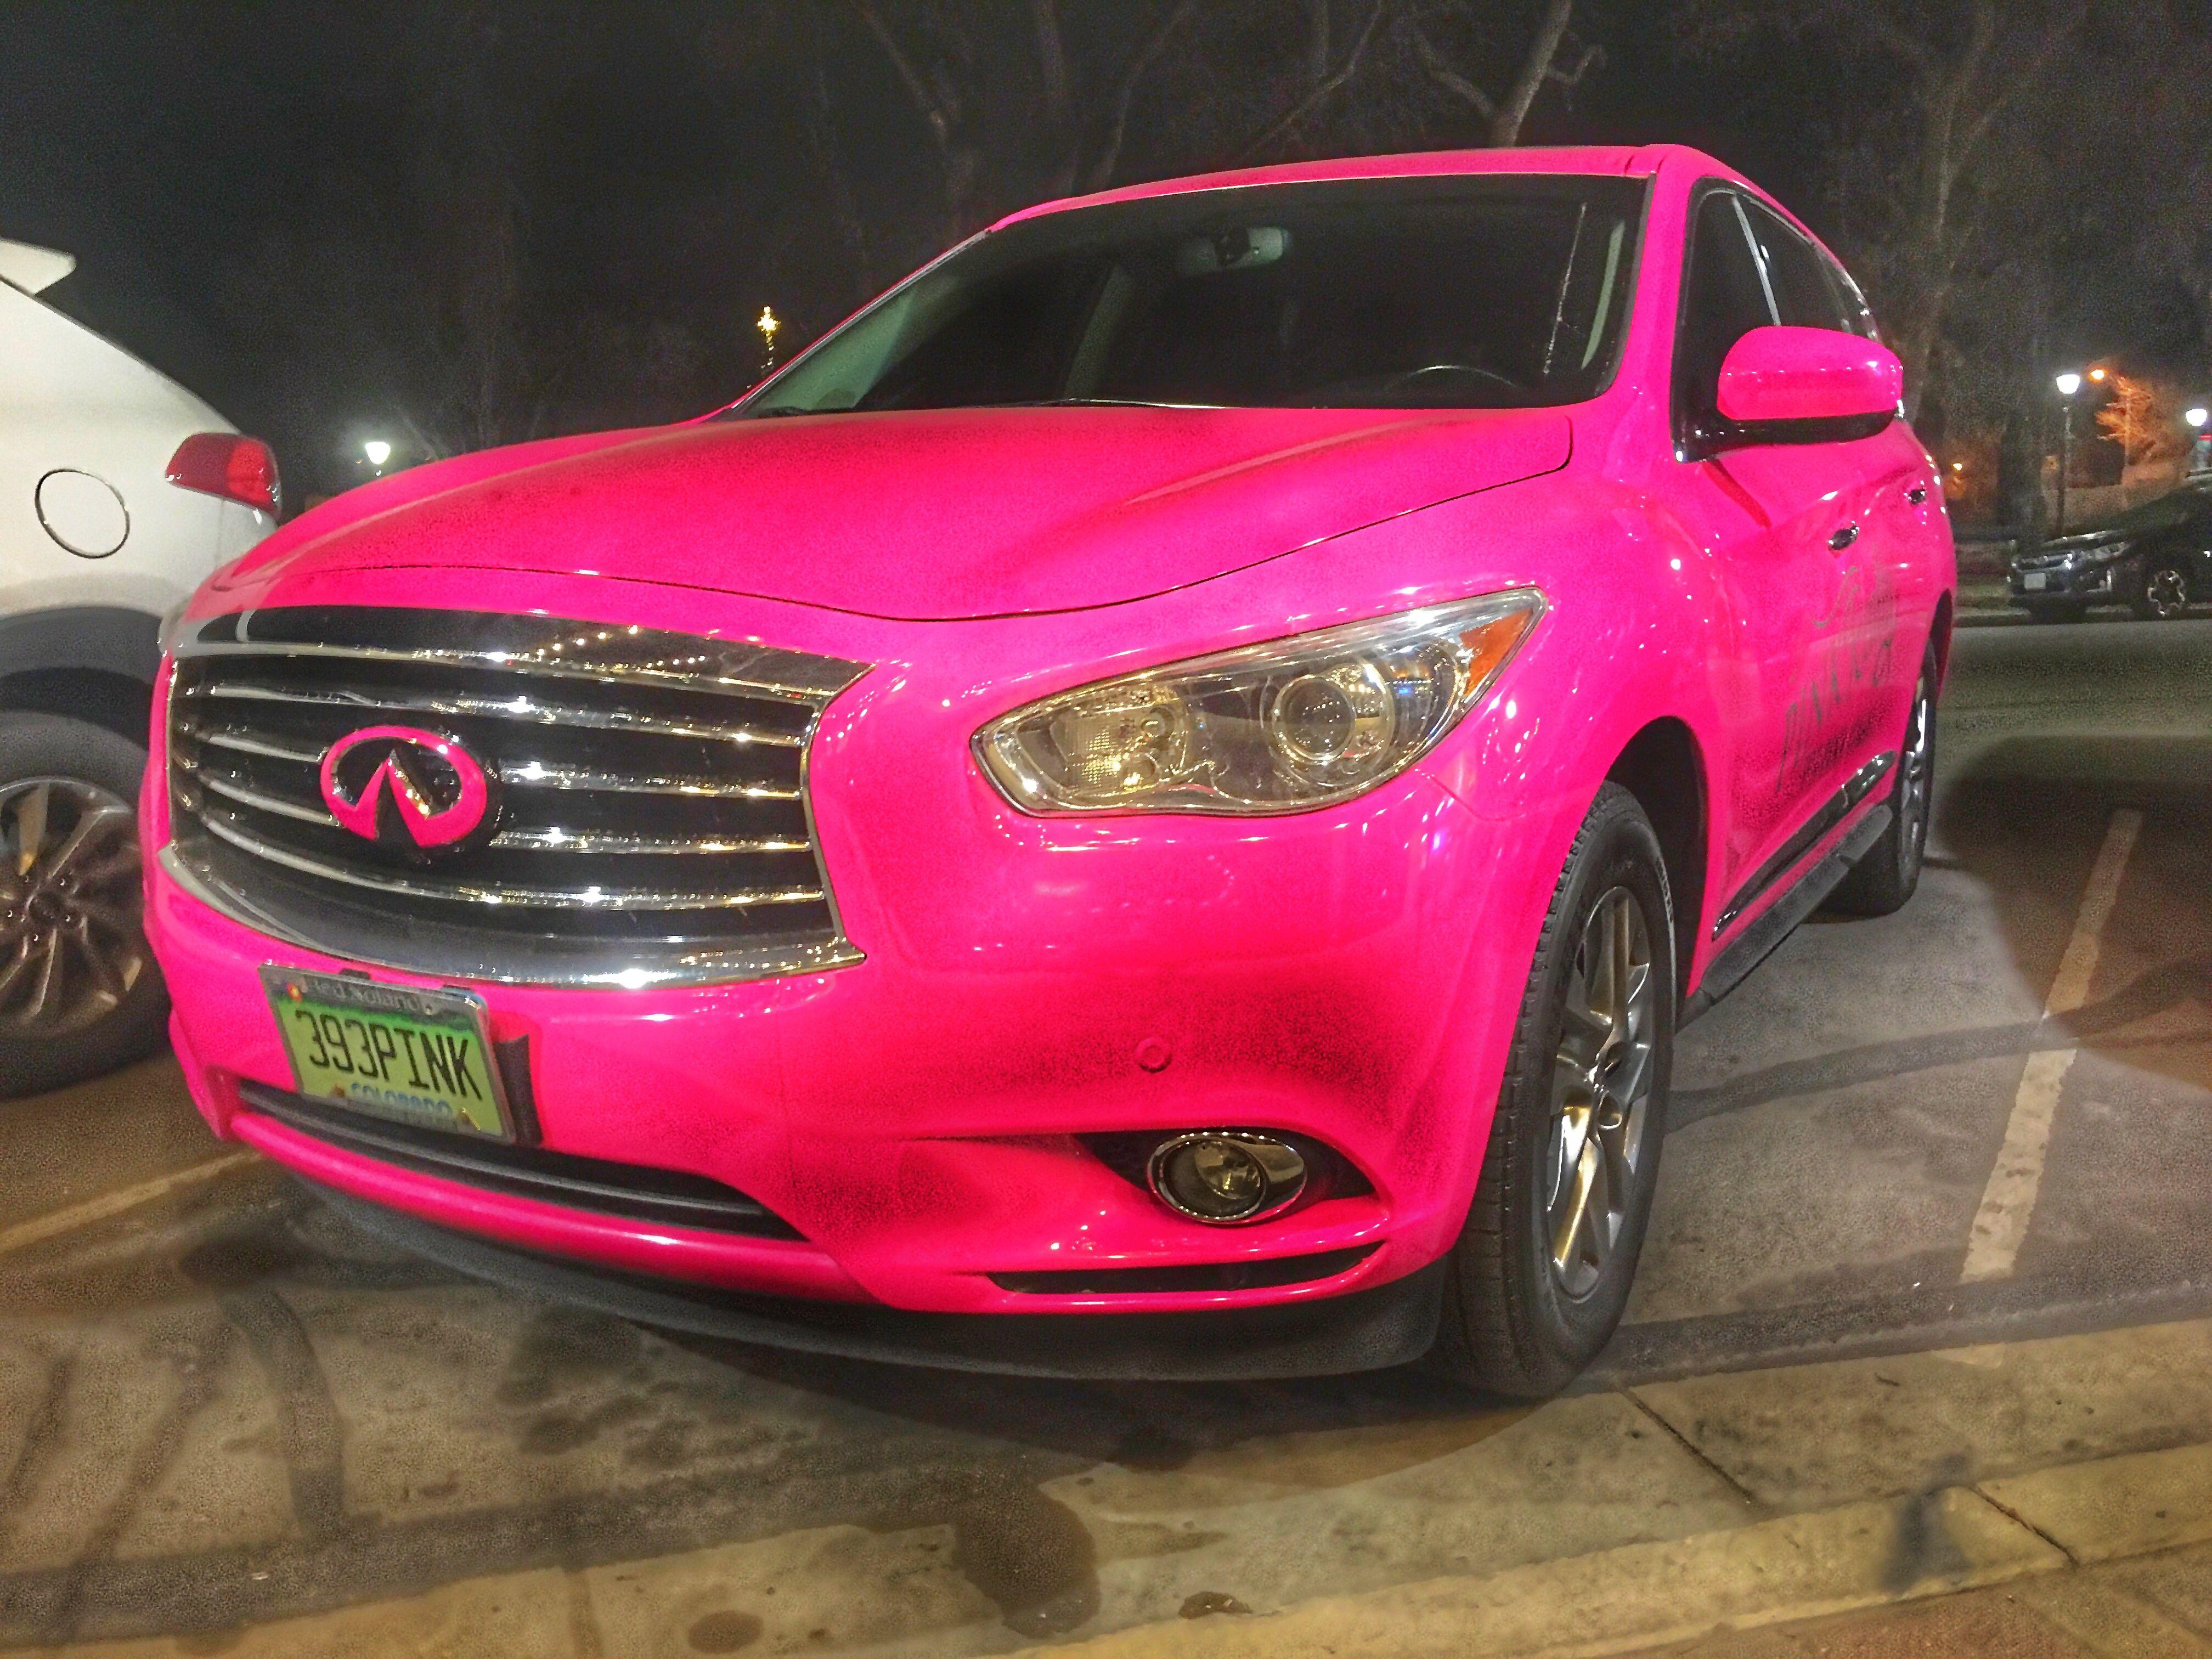 Pink Realty Car Pink Car Pink SUv Pink infiniti